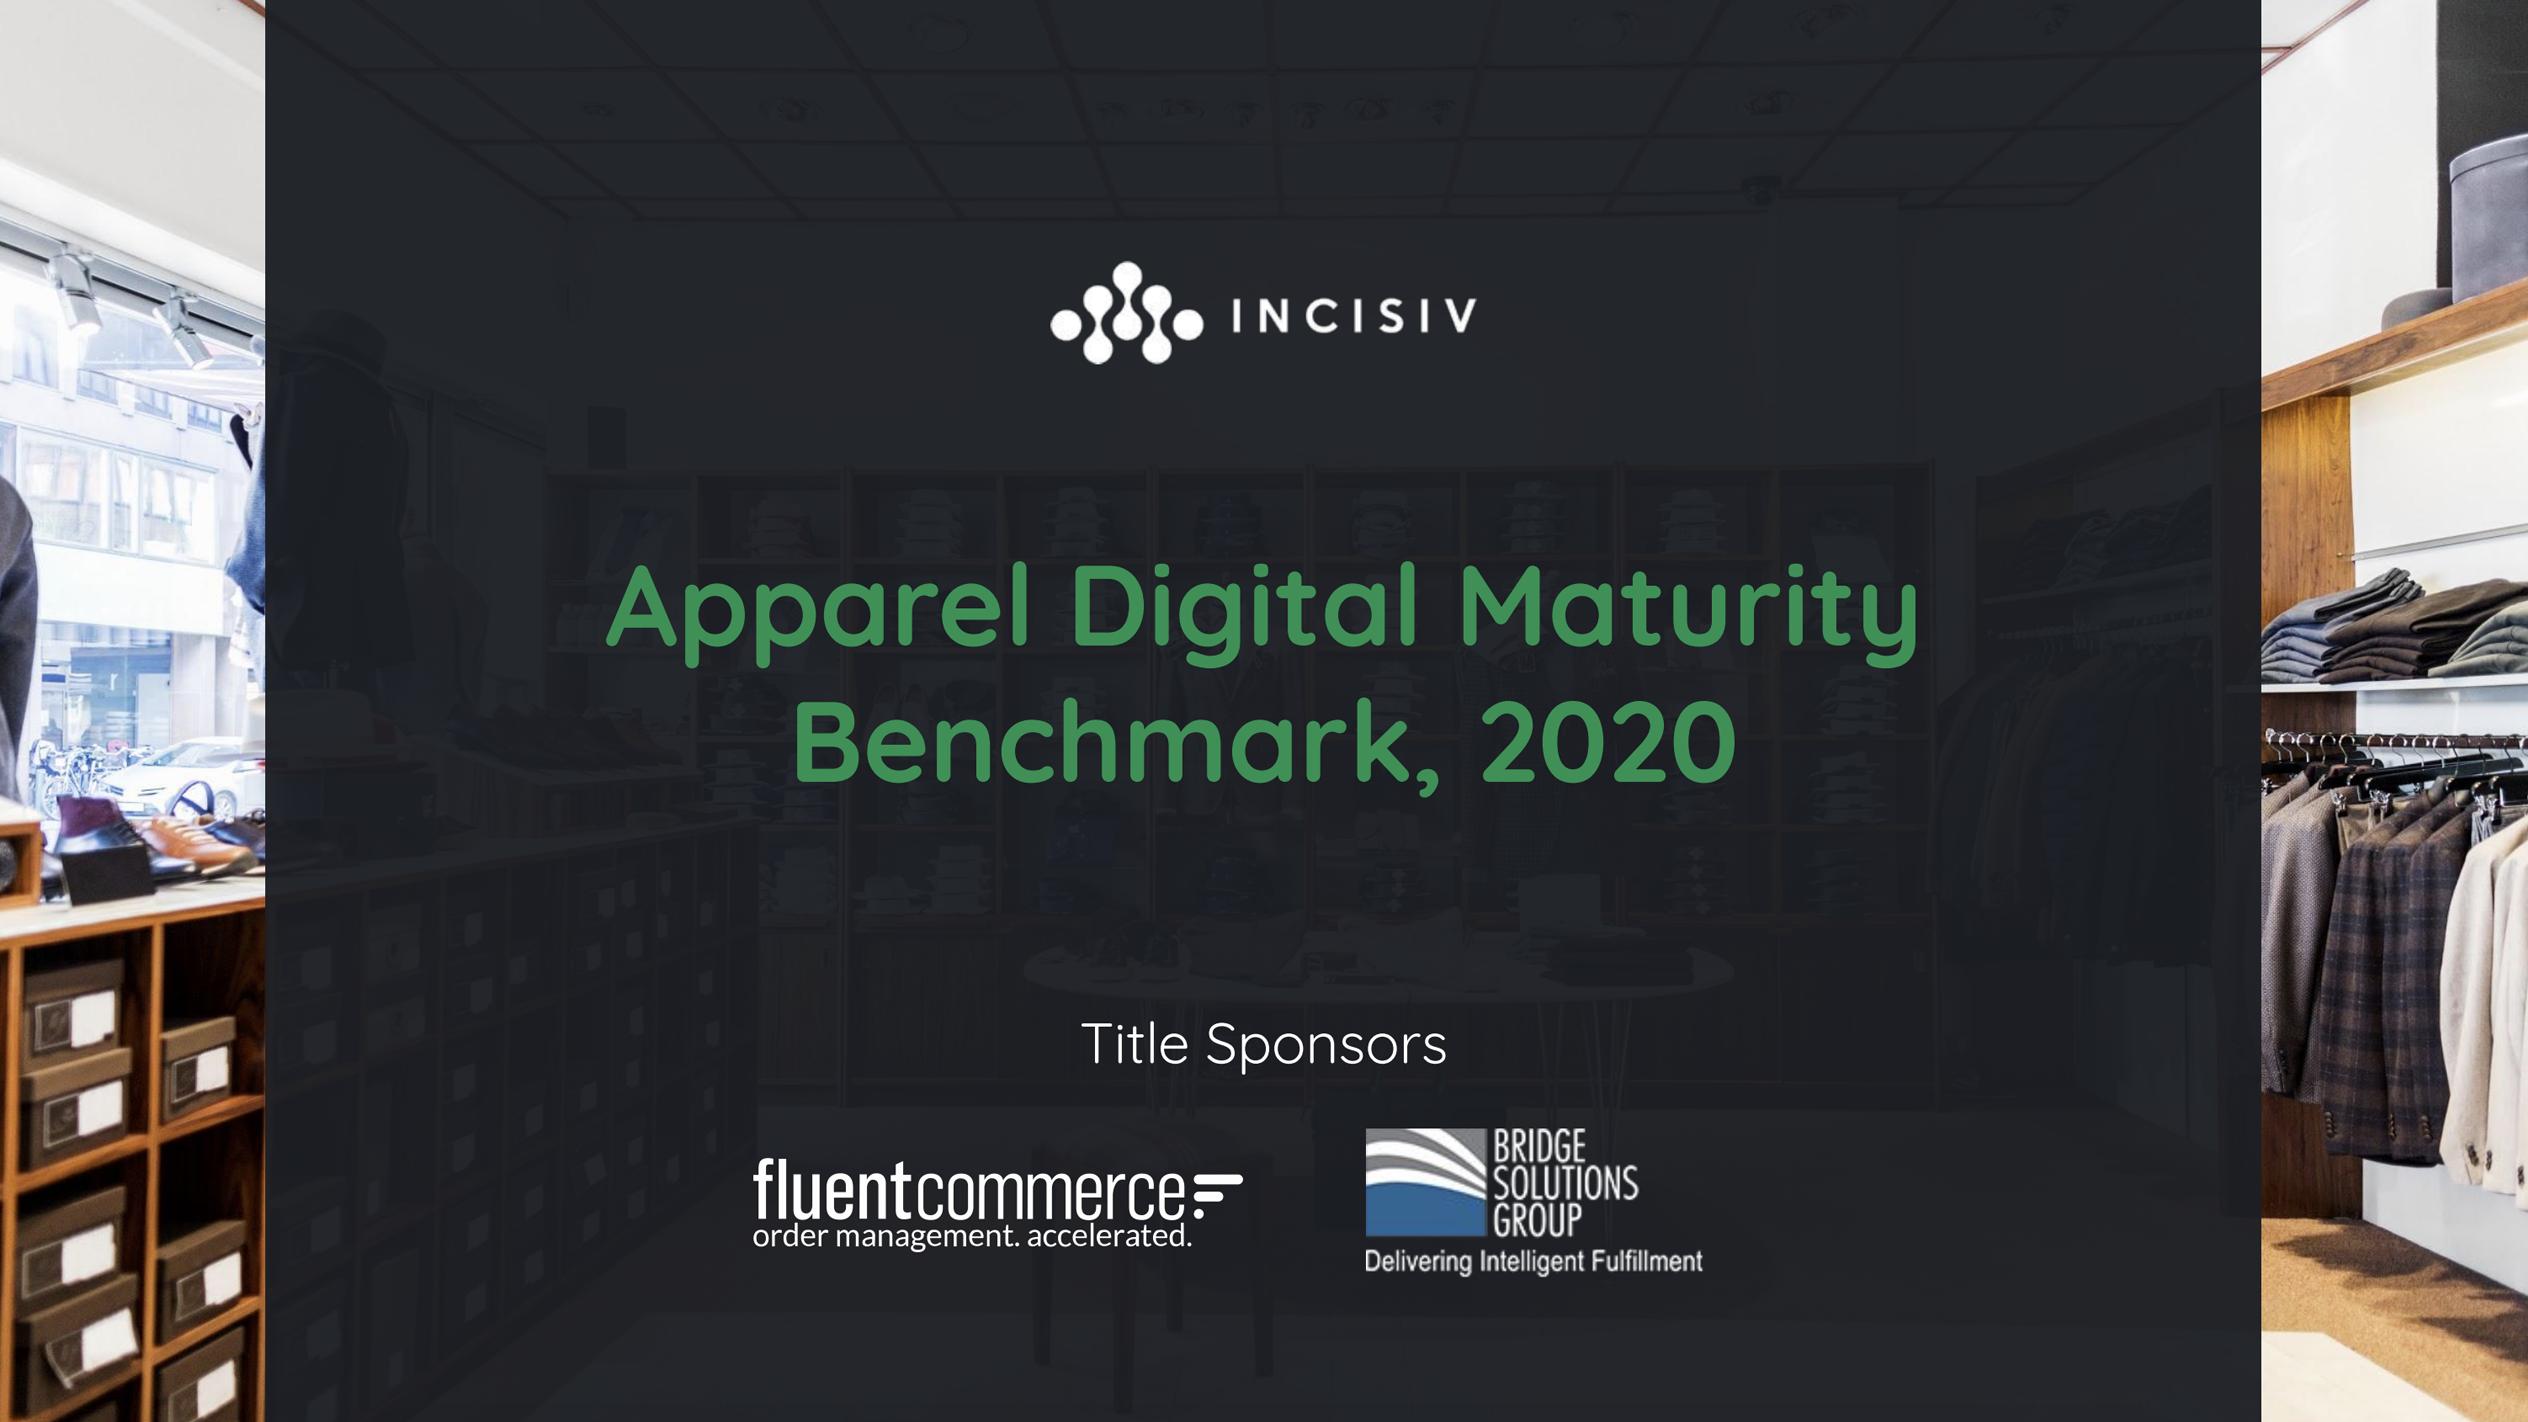 Apparel Digital Maturity Benchmark, 2020